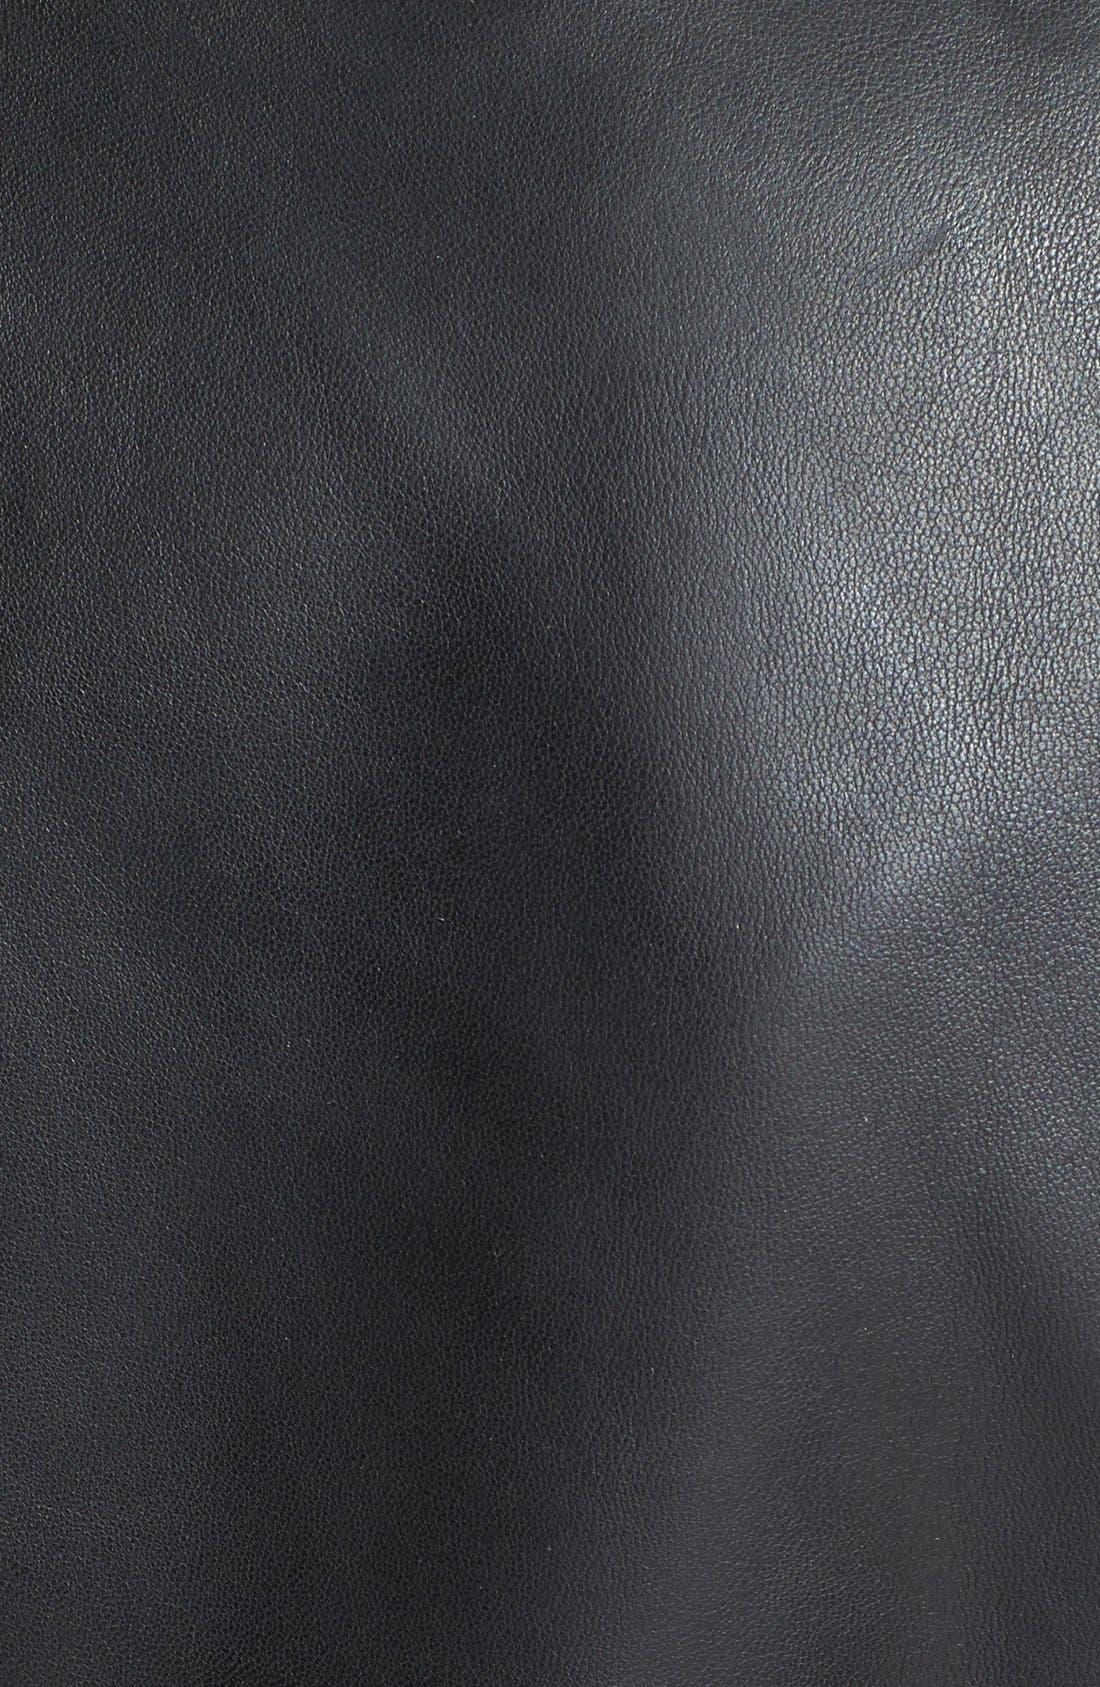 Alternate Image 3  - LaMarque Stripe Sleeve Detail Leather Jacket